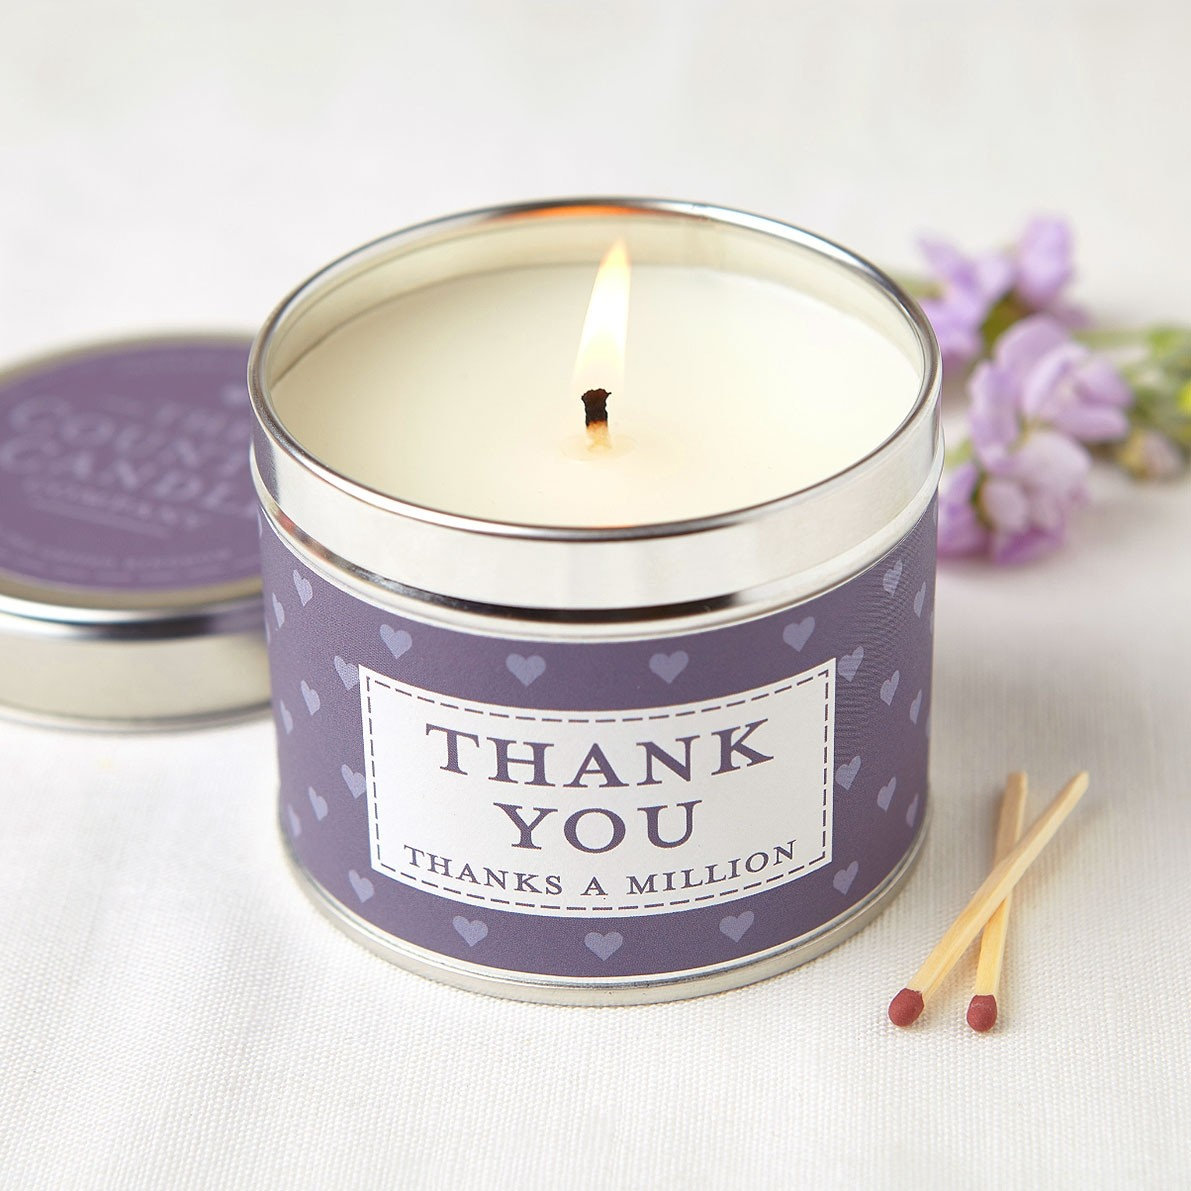 Thank You Tin Candle